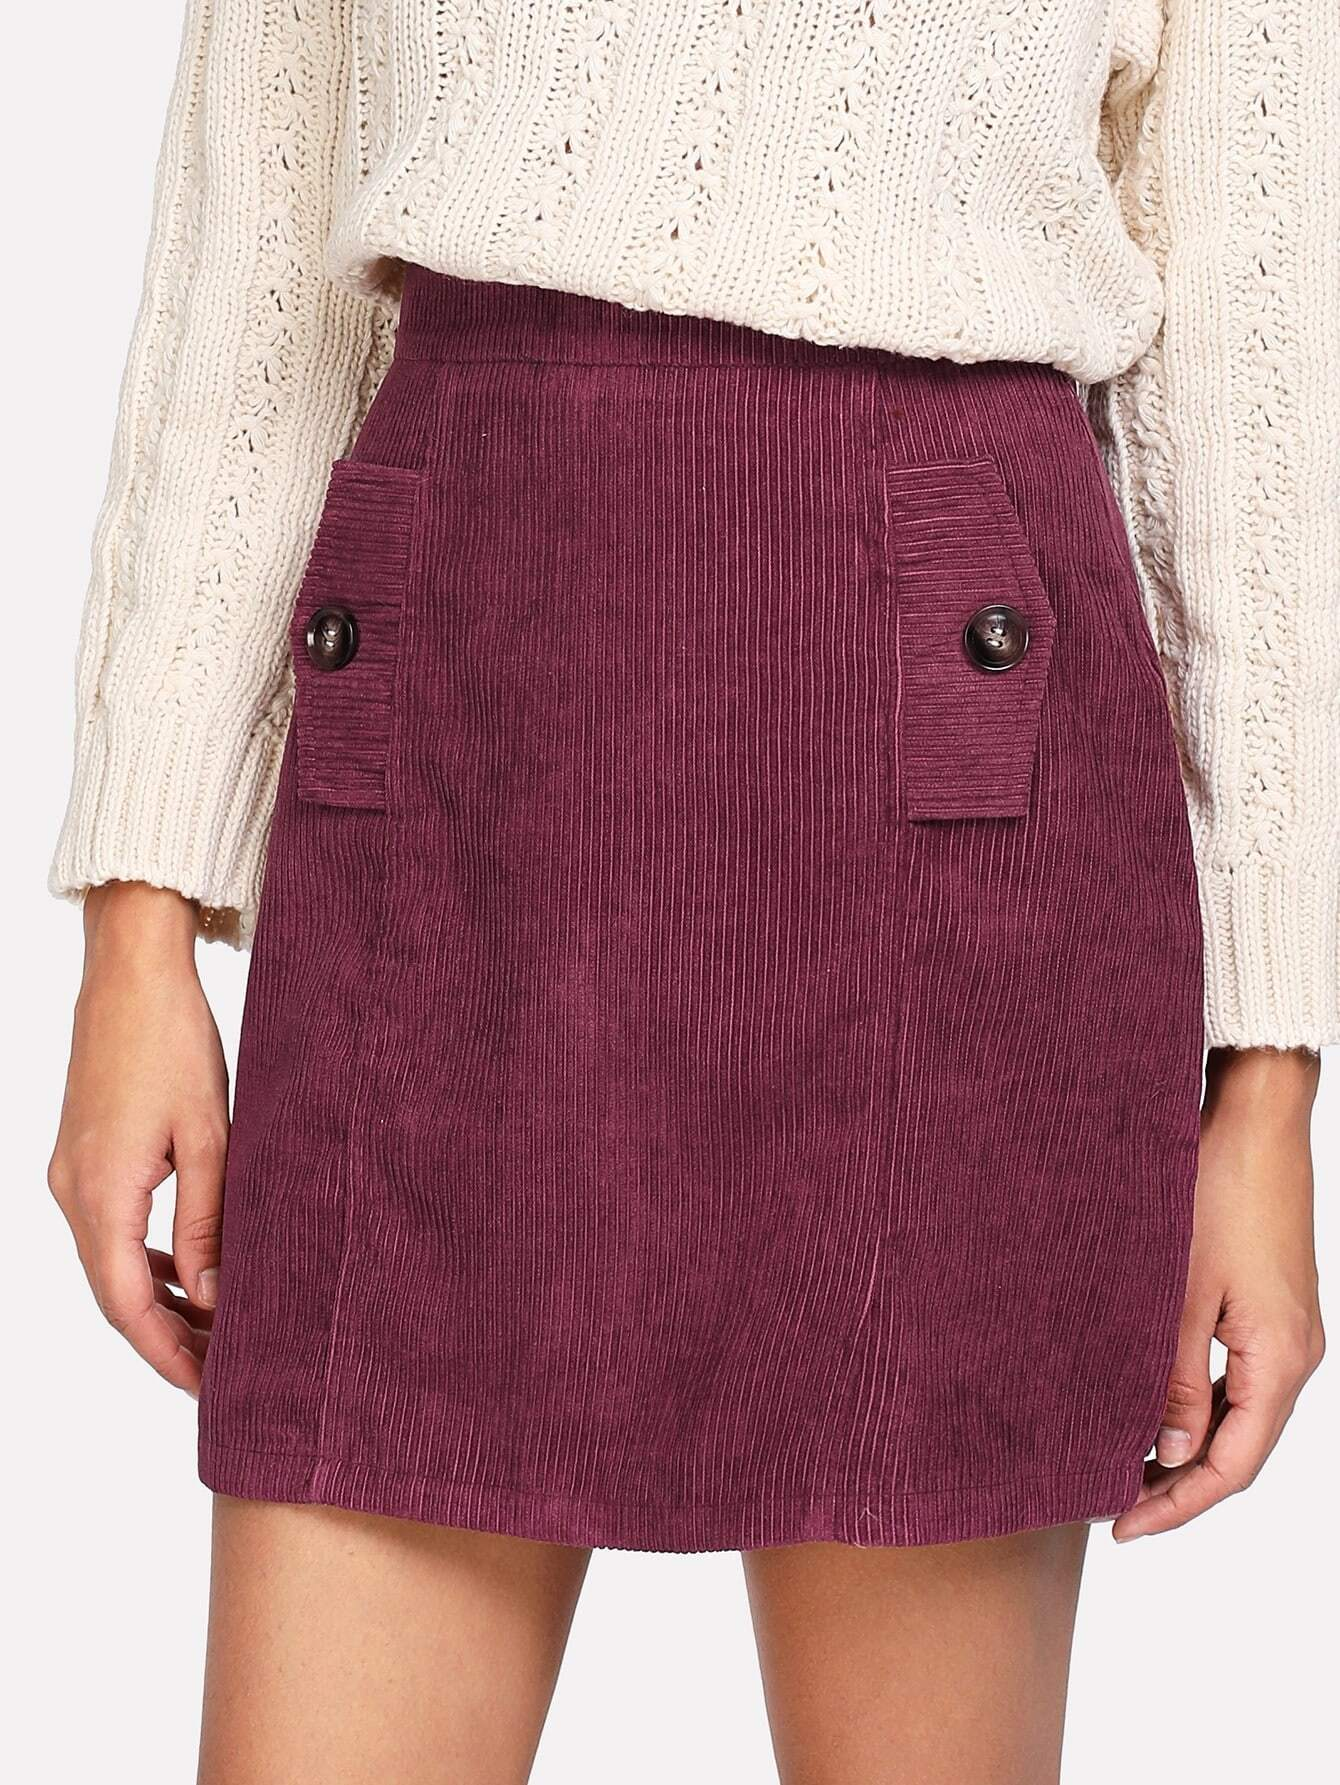 Zip Back Corduroy Skirt botanical embroidery zip back skirt